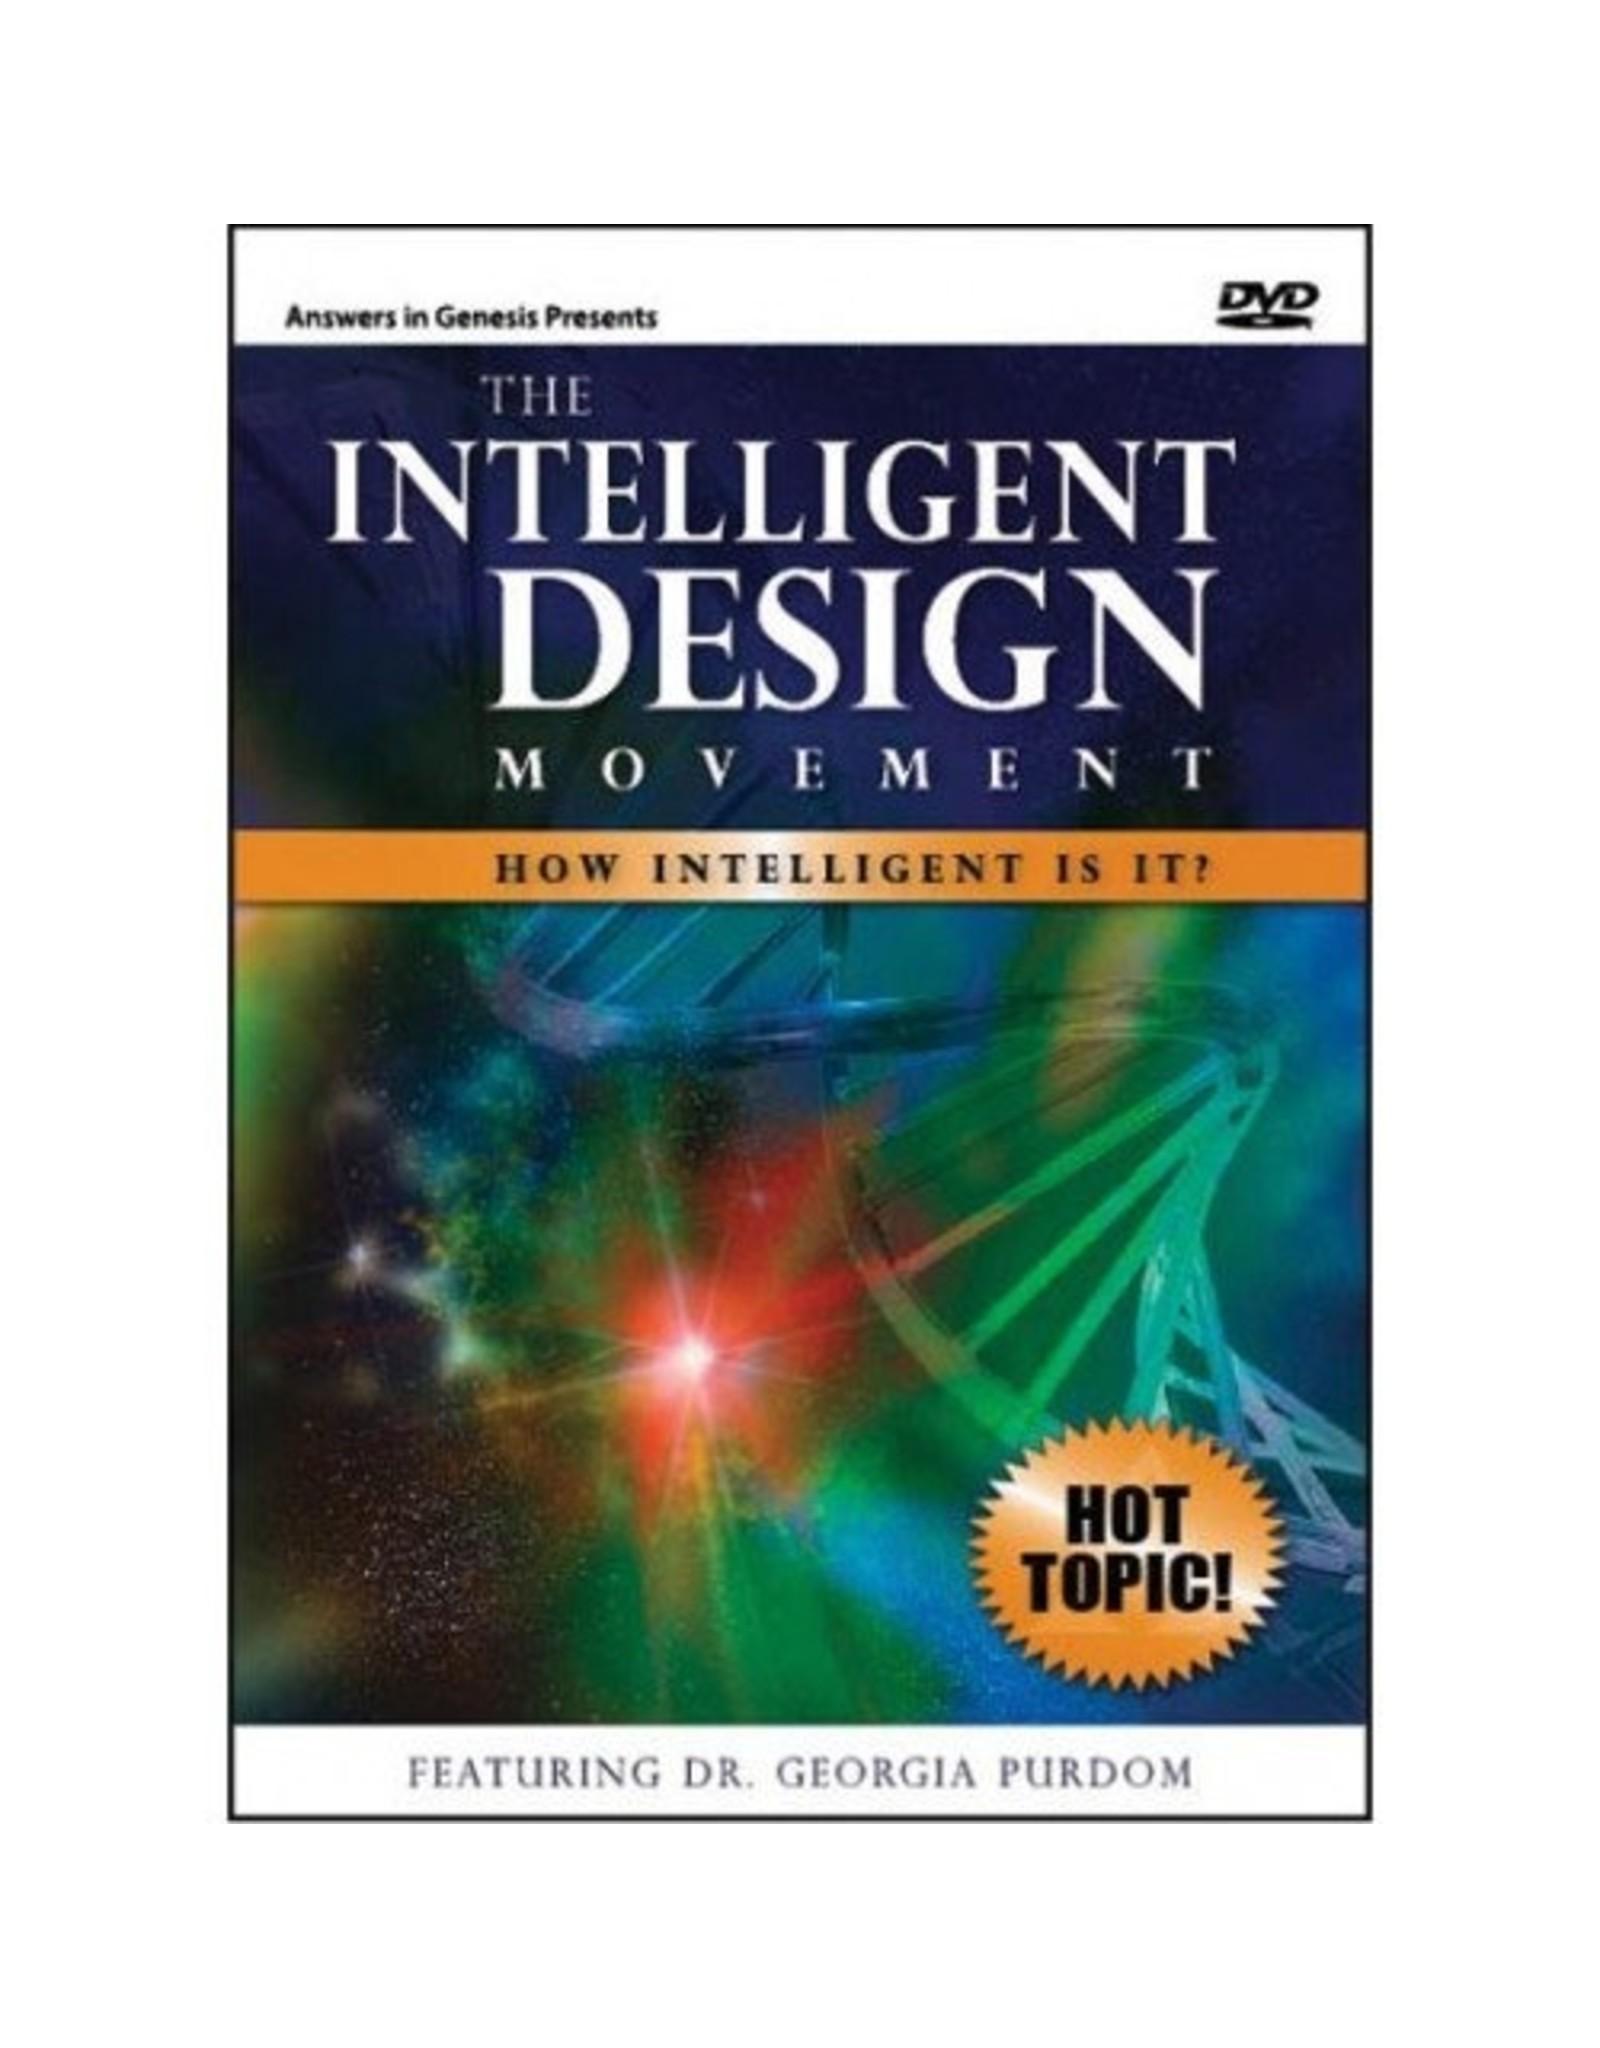 The Intelligent Design Movement: How Intelligent Is It? DVD